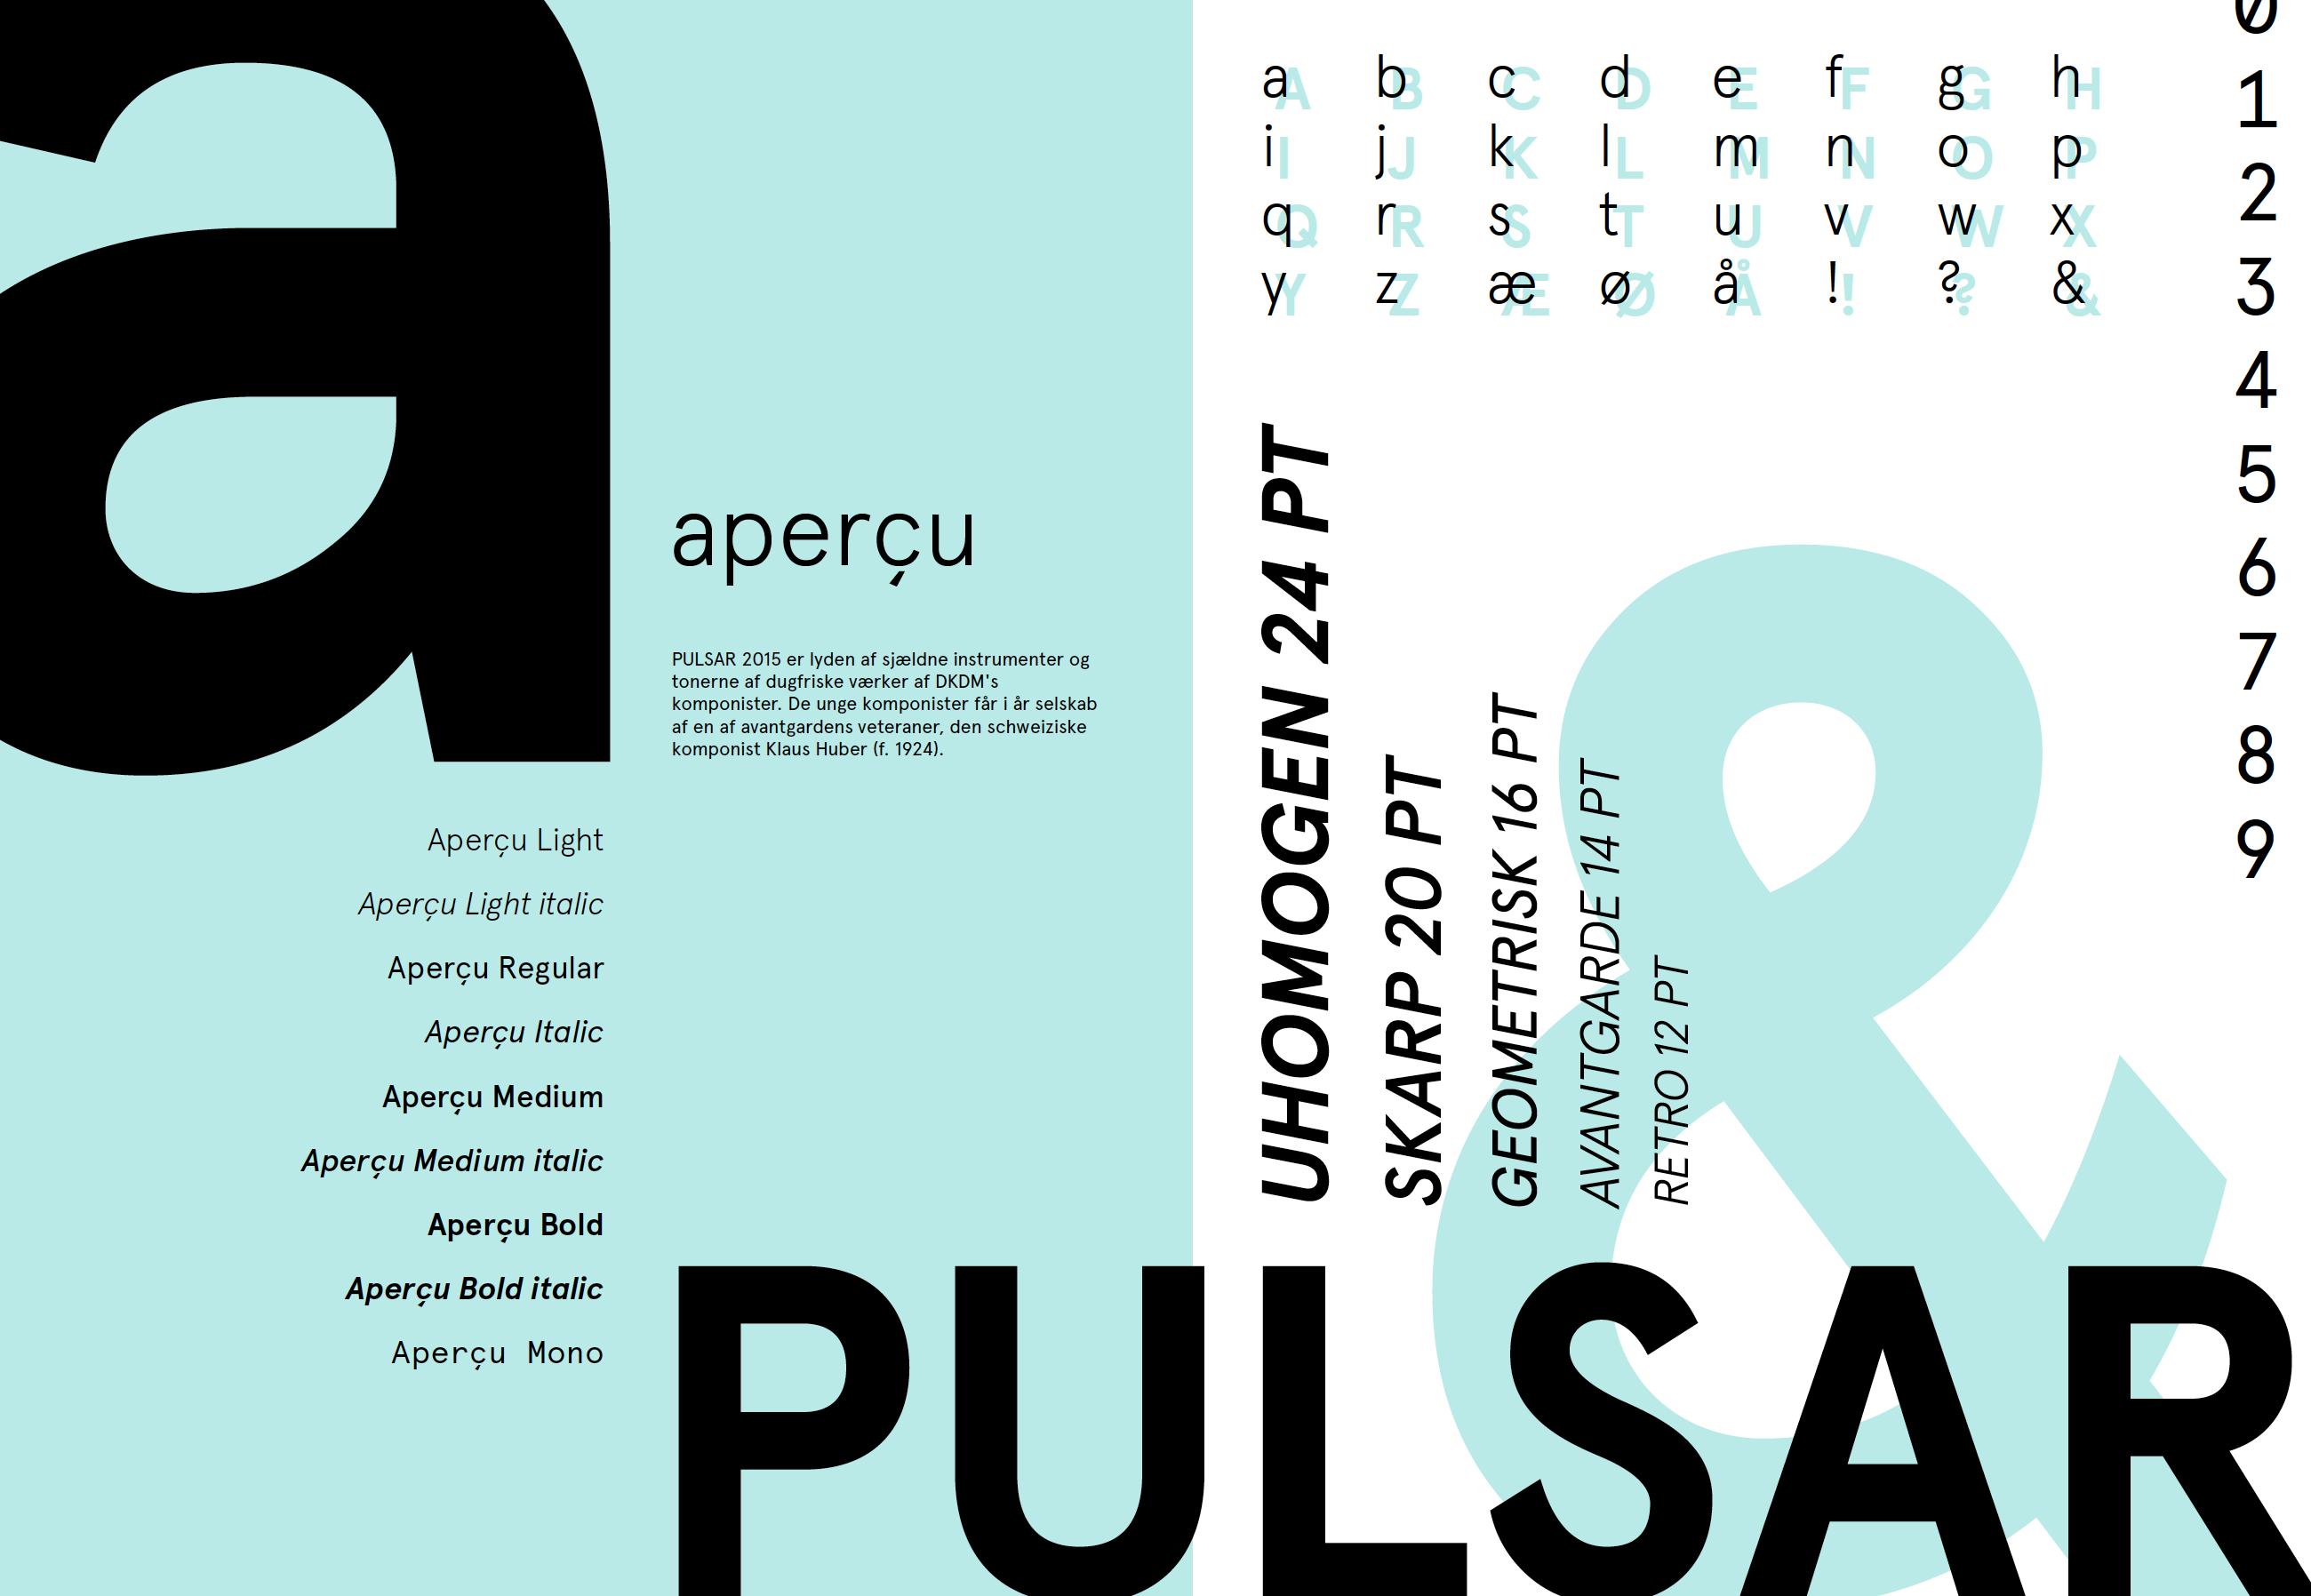 pulsar_philipjohansen_typography